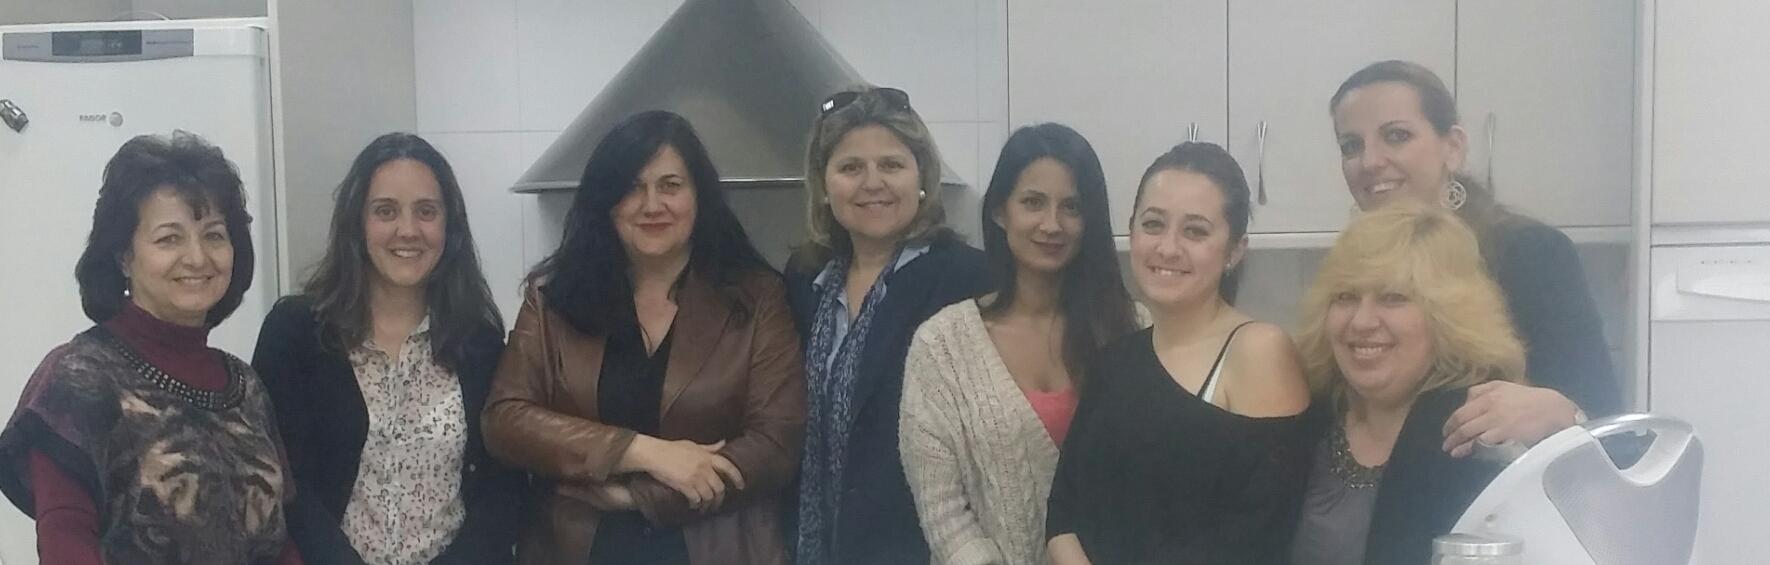 Delegación de Thermomix® en Zafra.